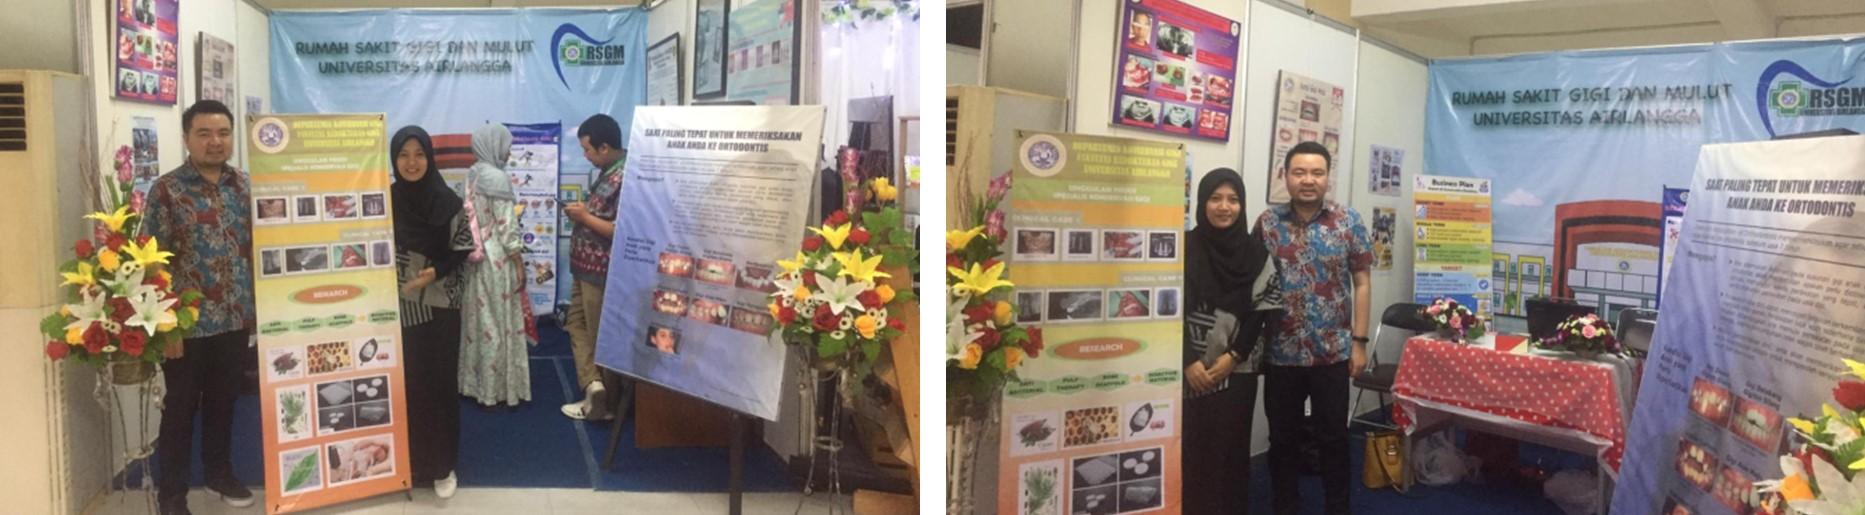 UniversitasAirlangga Participated in Airlangga Education Expo (AEE) 2020